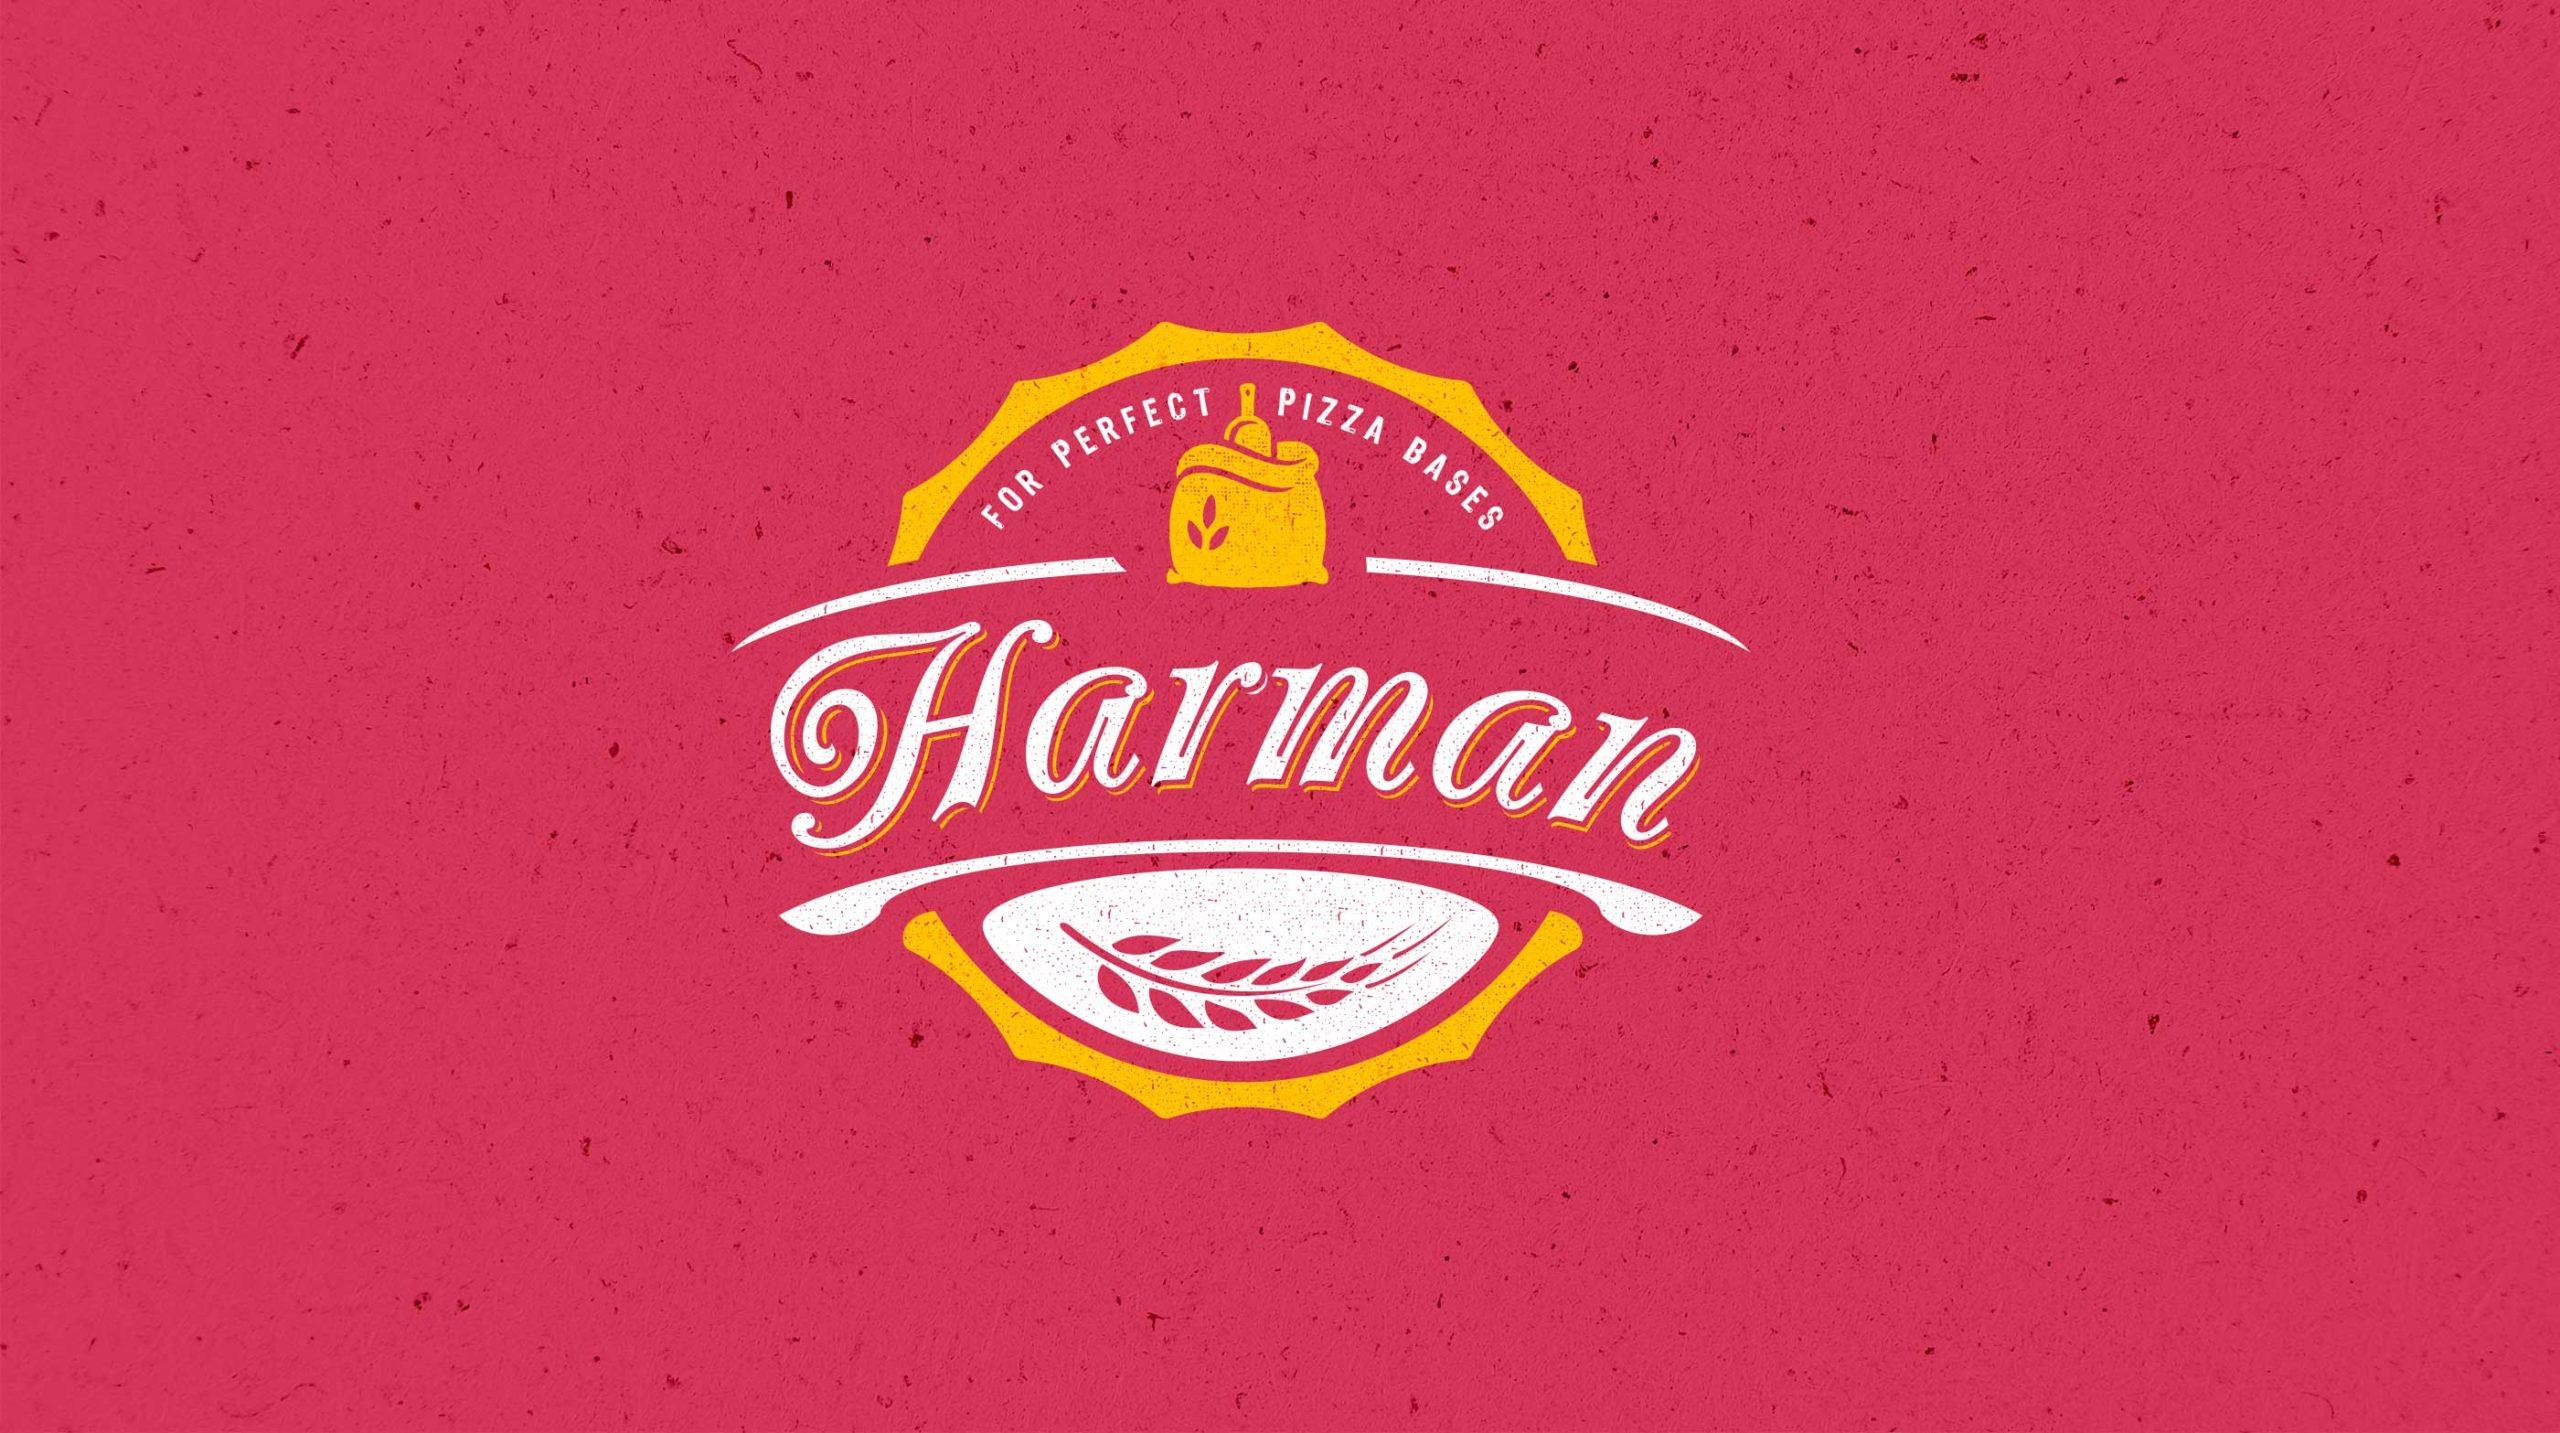 New Harman logo, designed by BONB Creative & Design